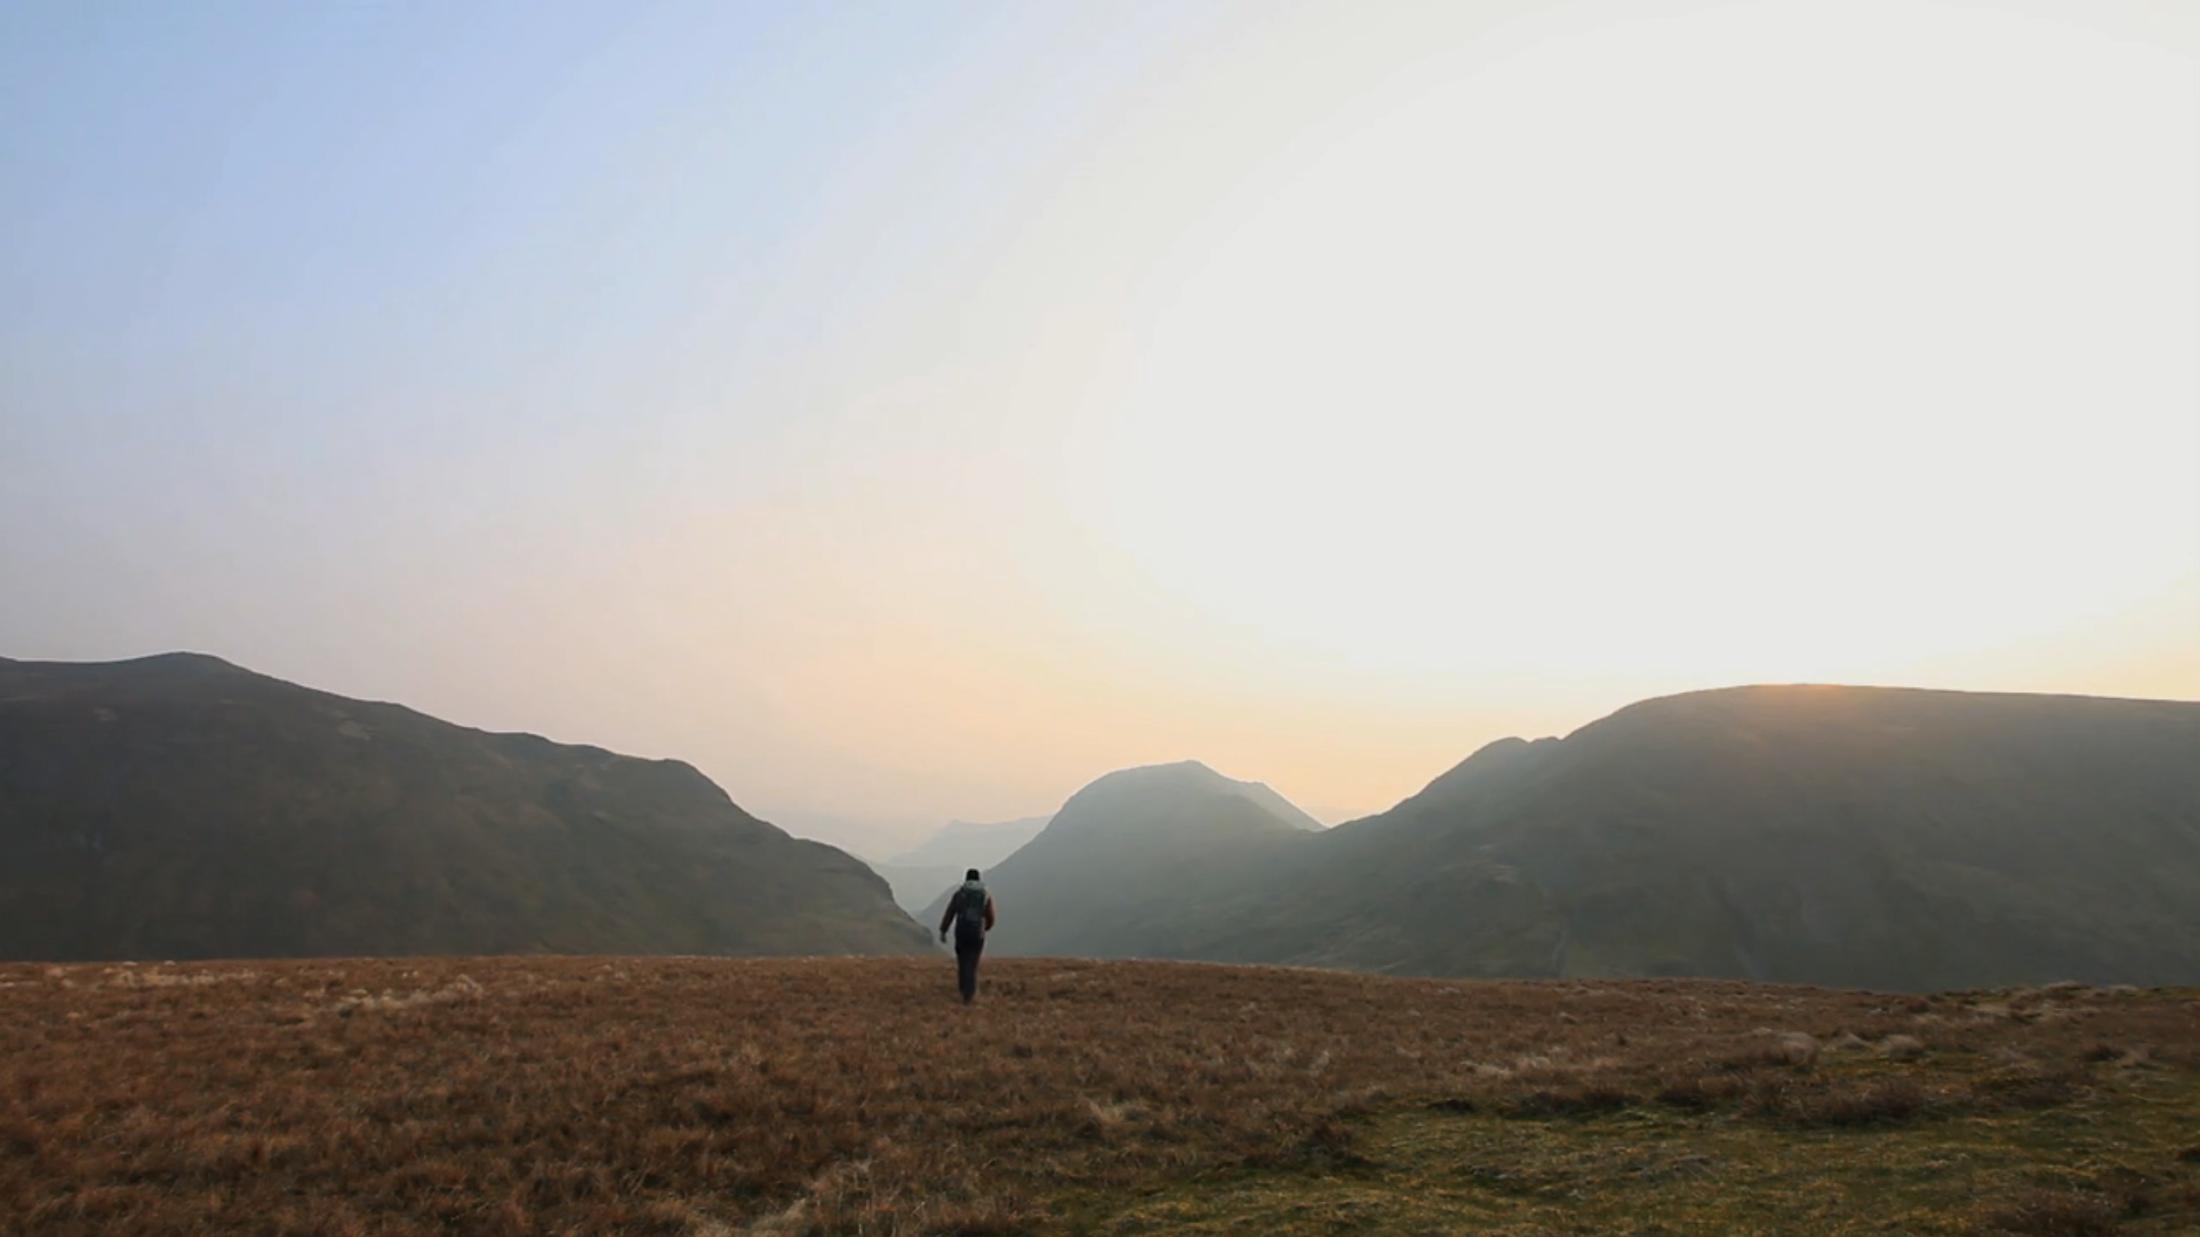 alastair humphreys hiking towards edge of field at dusk